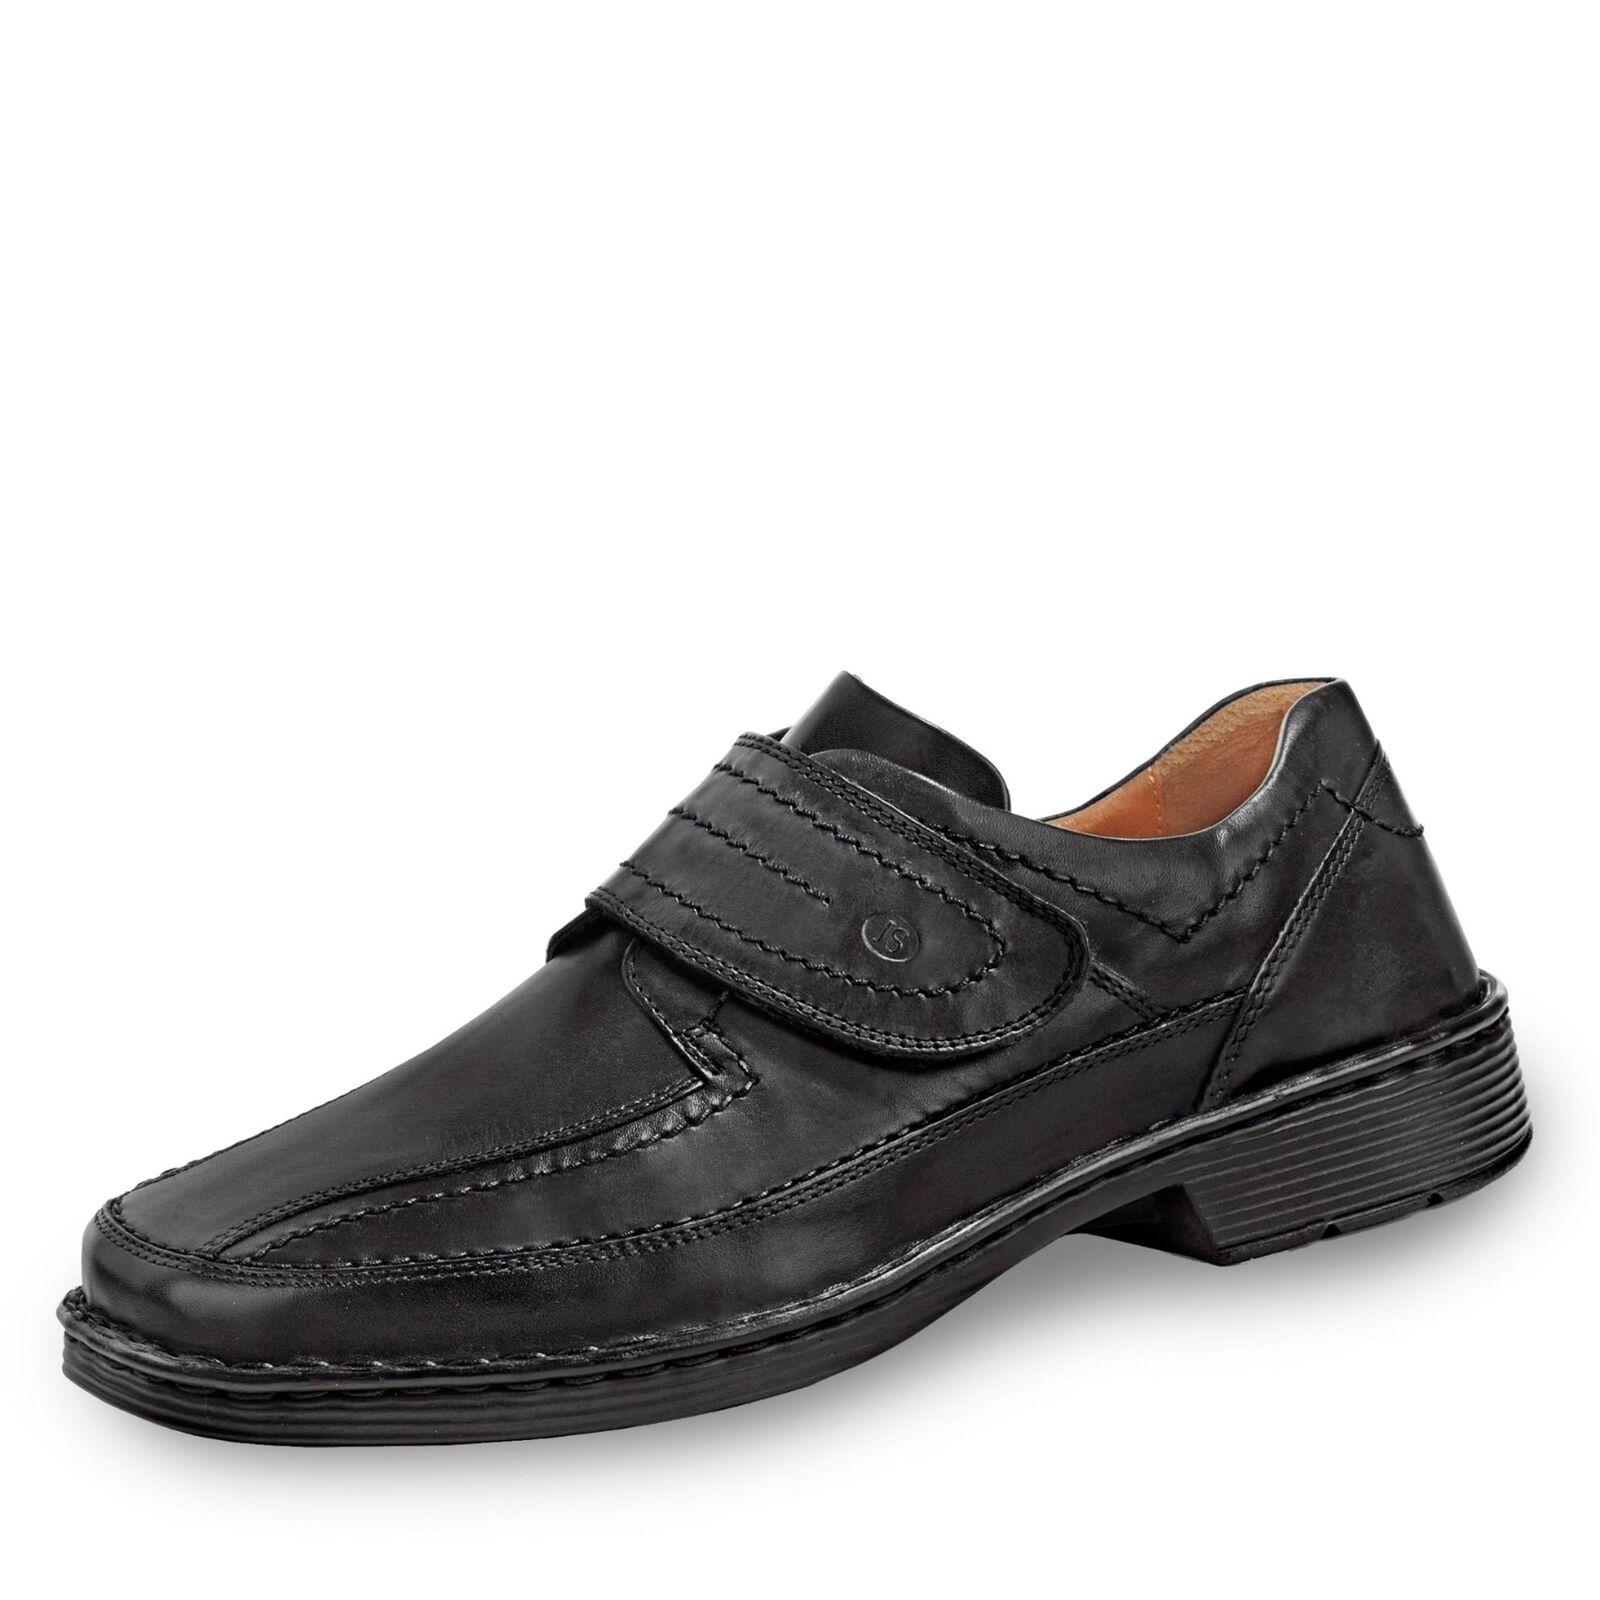 Josef Seibel Herren Halbschuh Businessschuhe Komfortschuhe Schuhe Leder schwarz